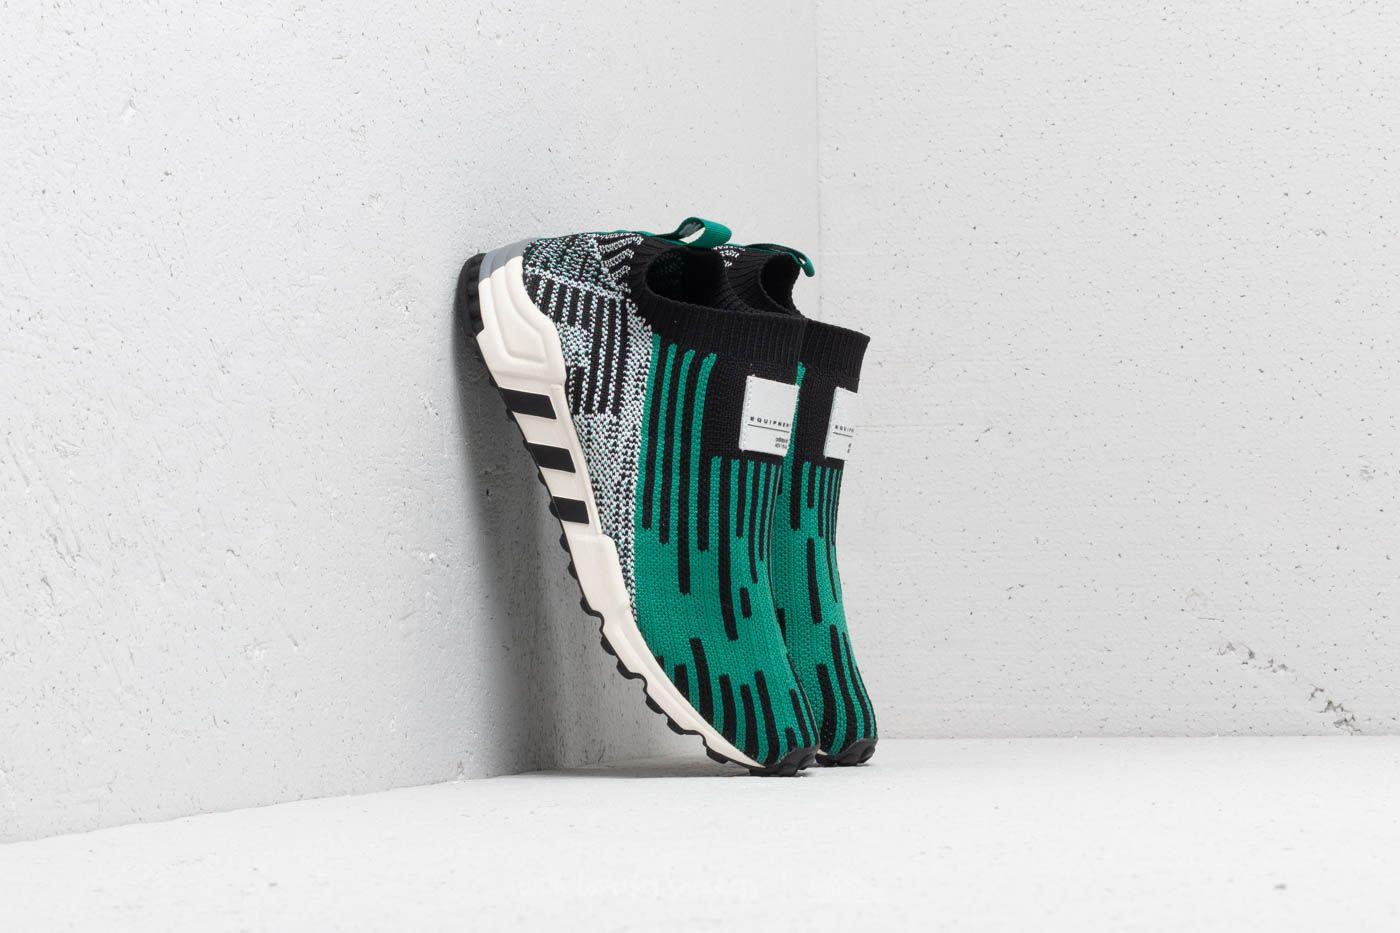 adidas EQT Support SK Primeknit Core Black/ Sub Green/ Ftw White